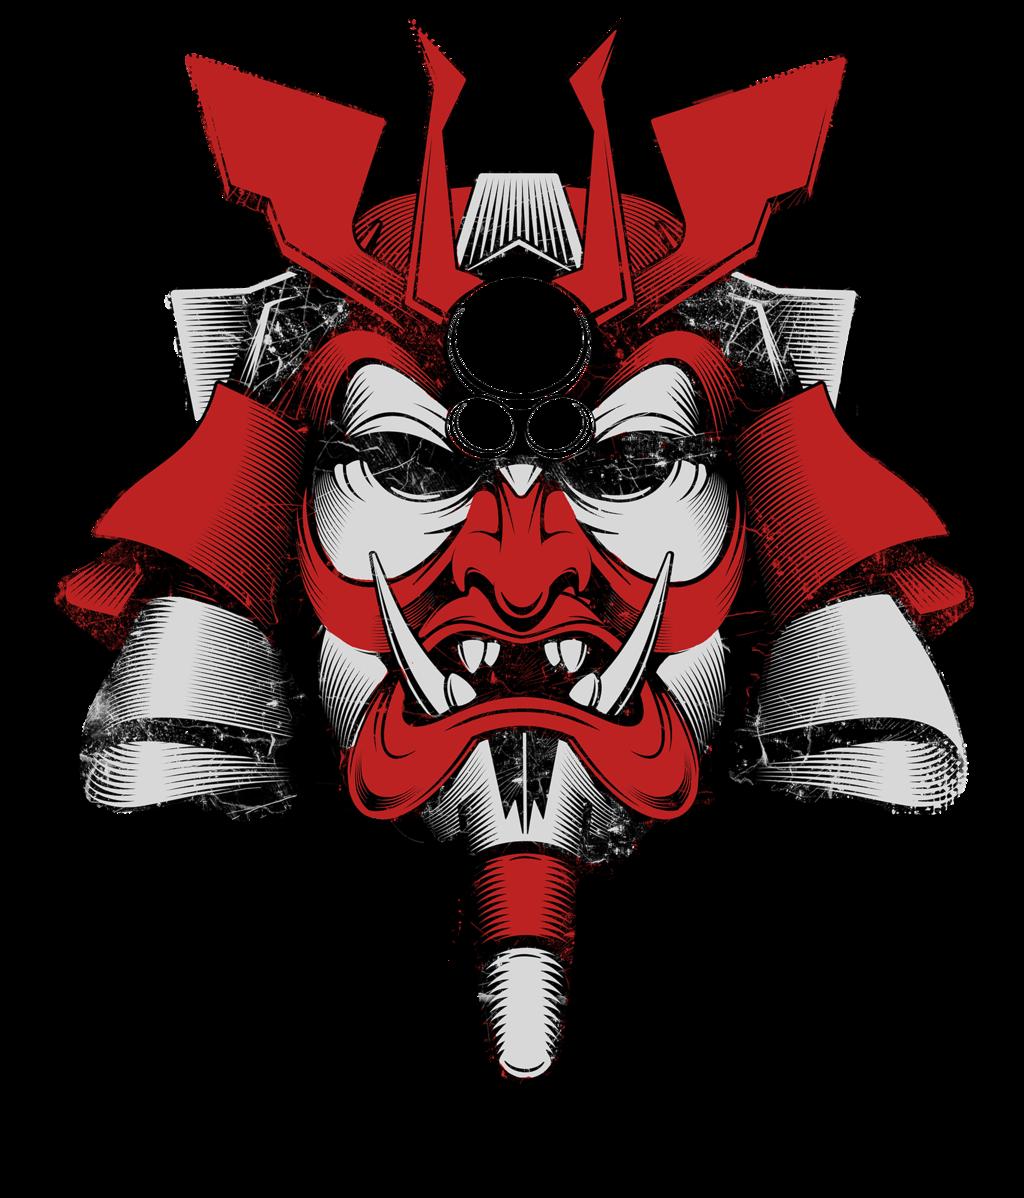 Samurai Mask Of Doom By Burningeyestudios On Deviantart Samurai Wallpaper Japanese Mask Tattoo Japanese Tattoo